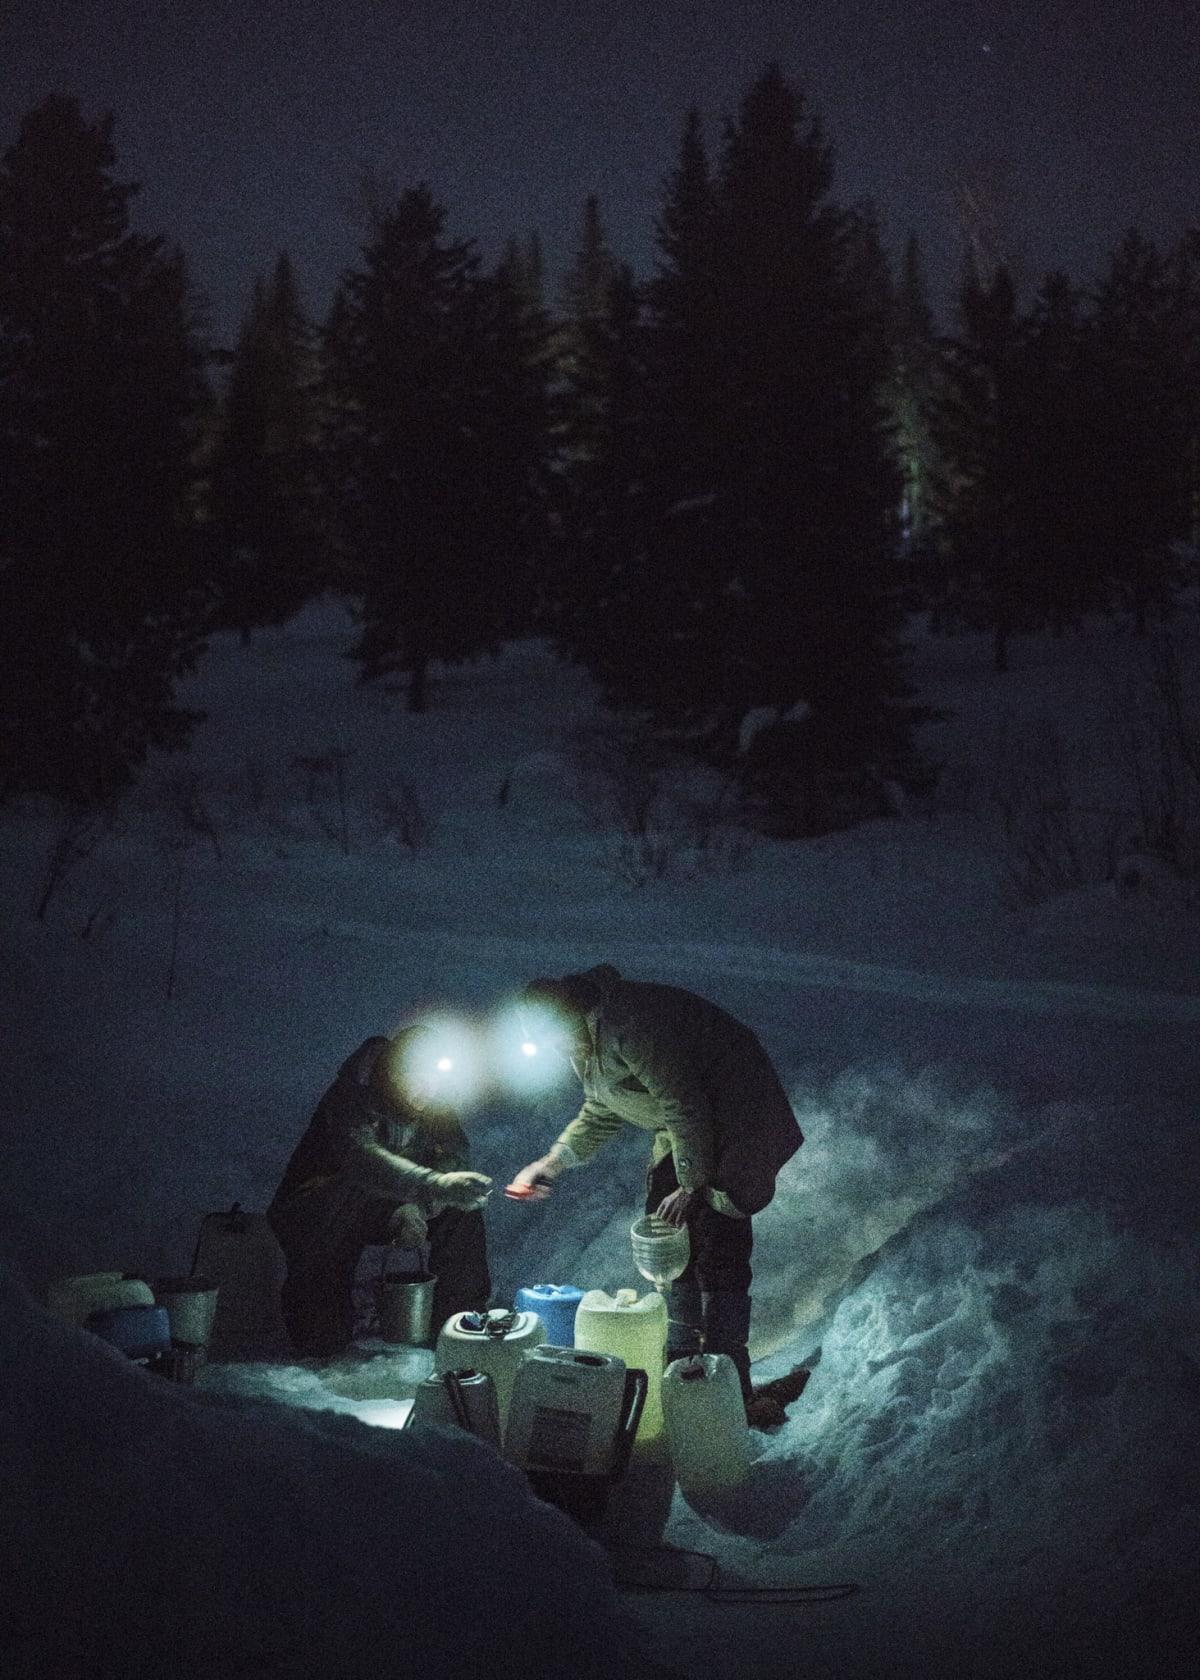 Jonas Bendiksen, Fetching water from the stream, Russia, 2016